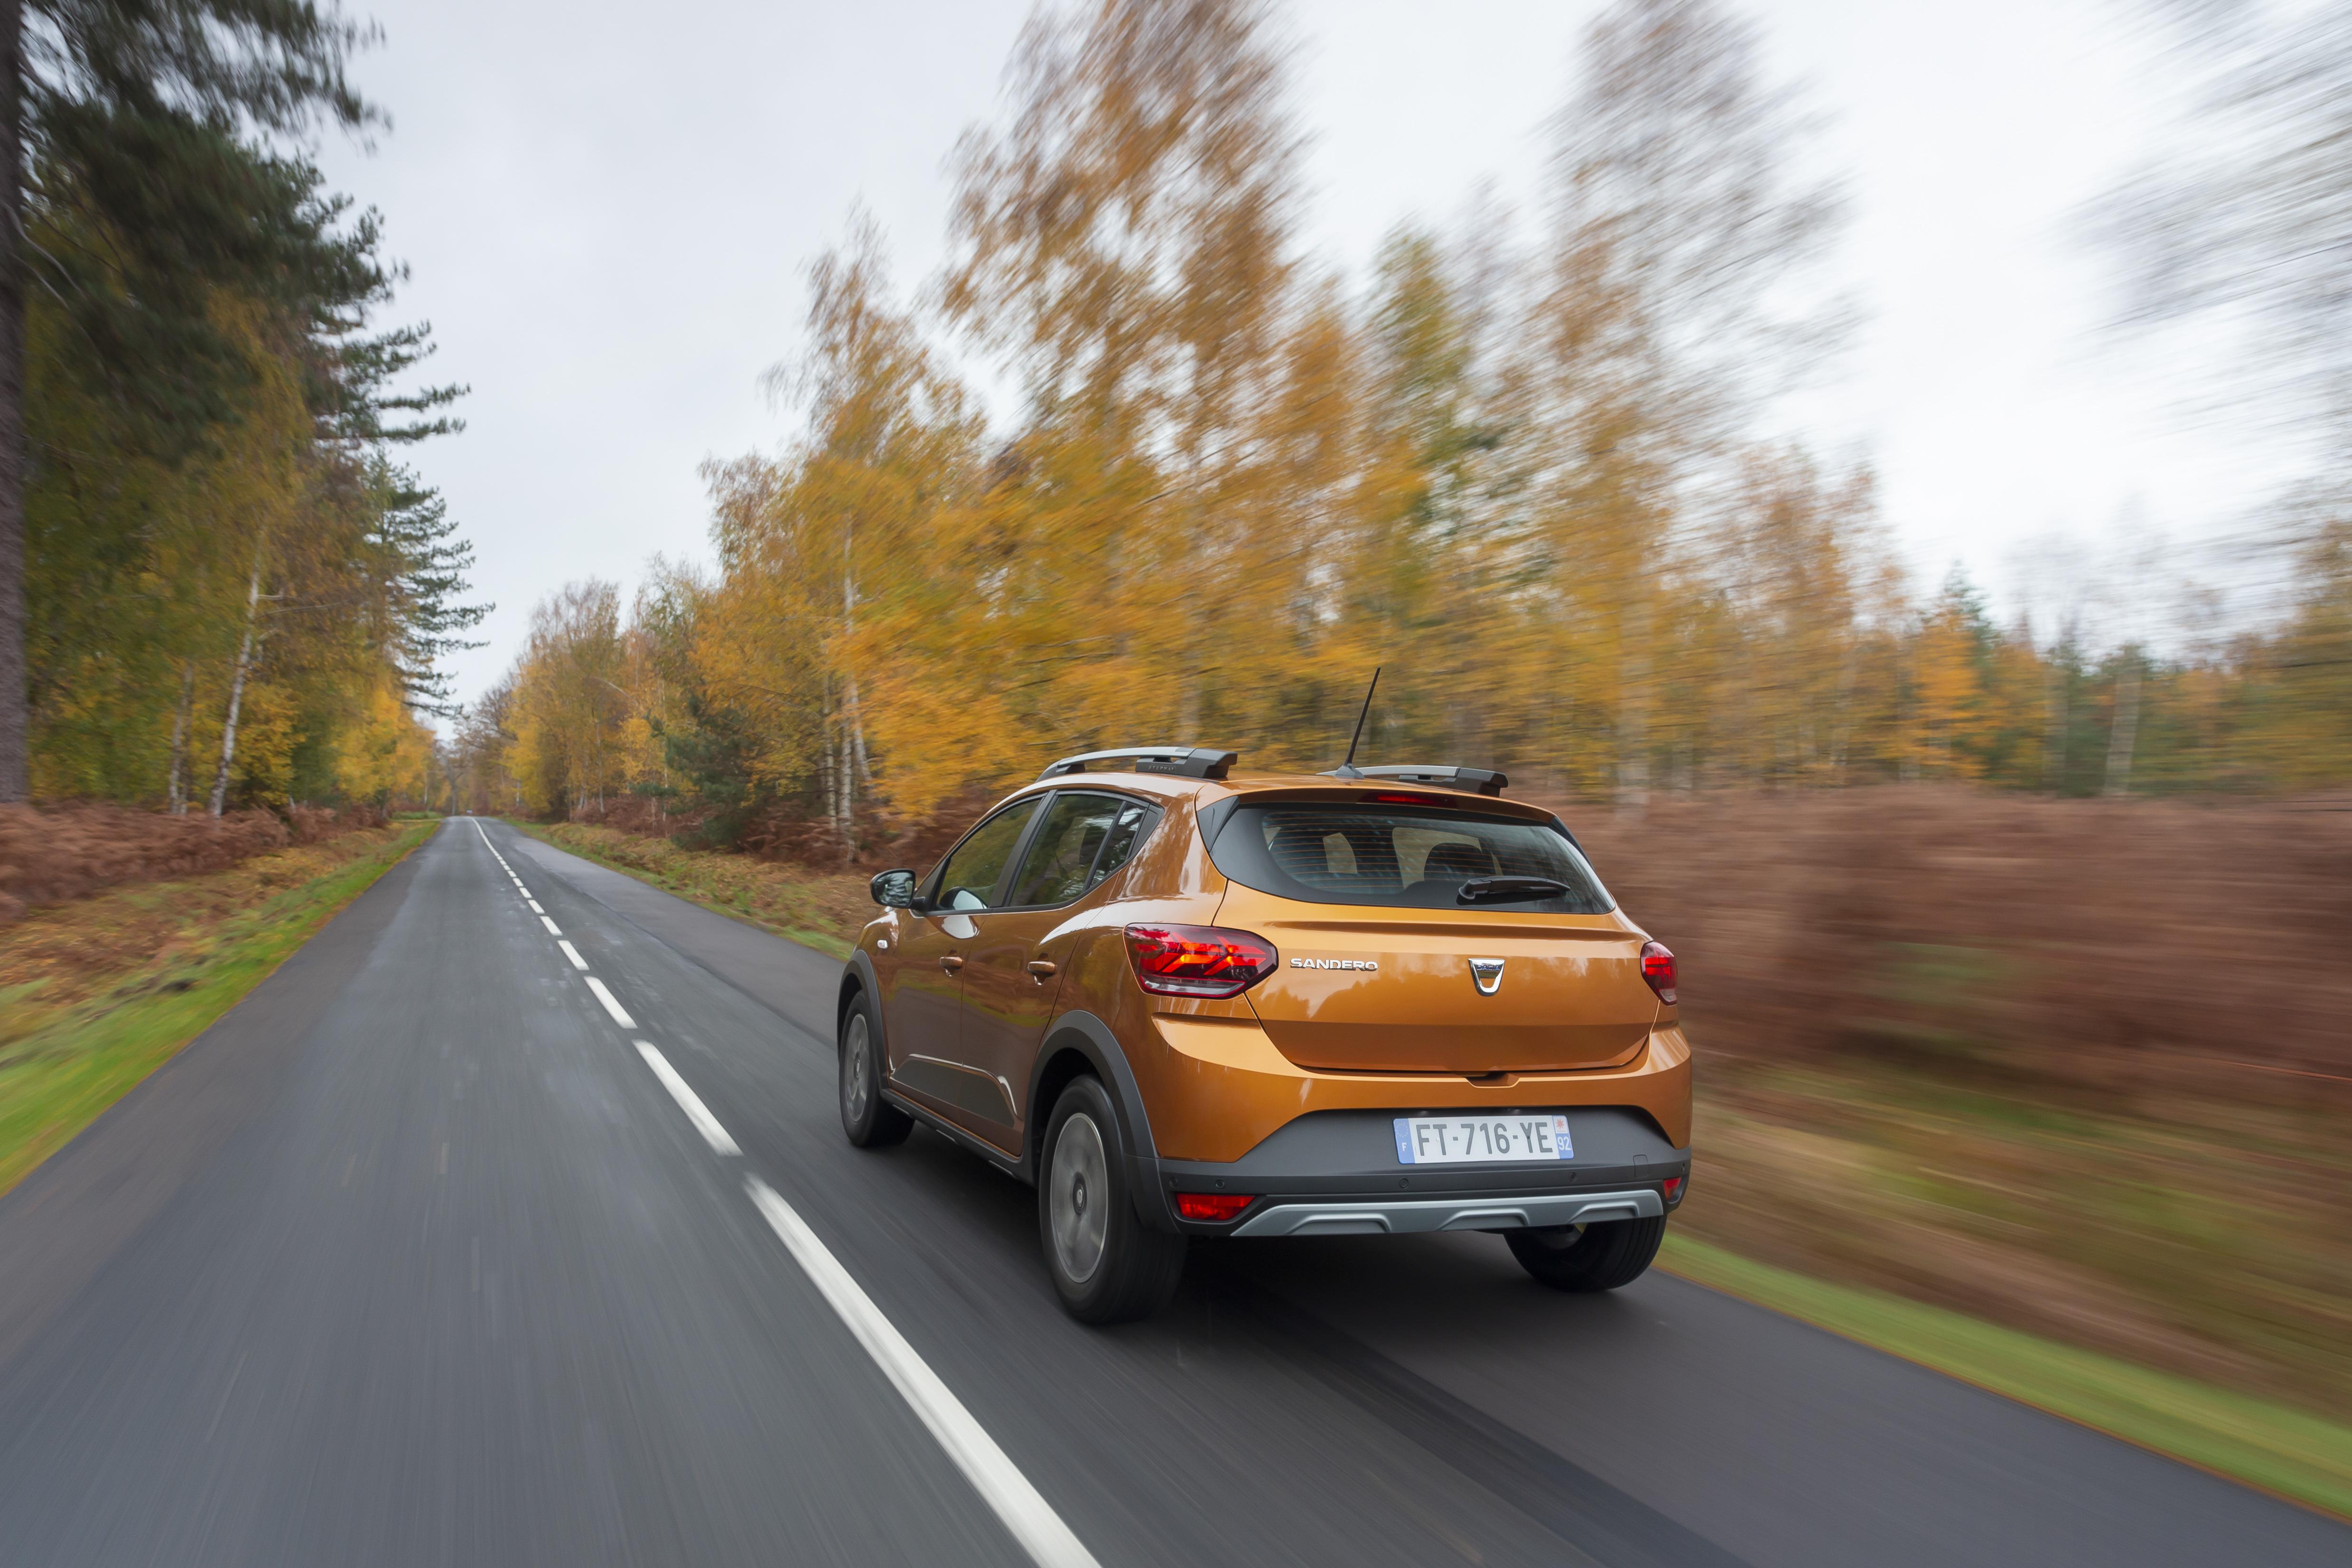 2020 - Essais presse Nouvelle Dacia SANDERO STEPWAY (1)